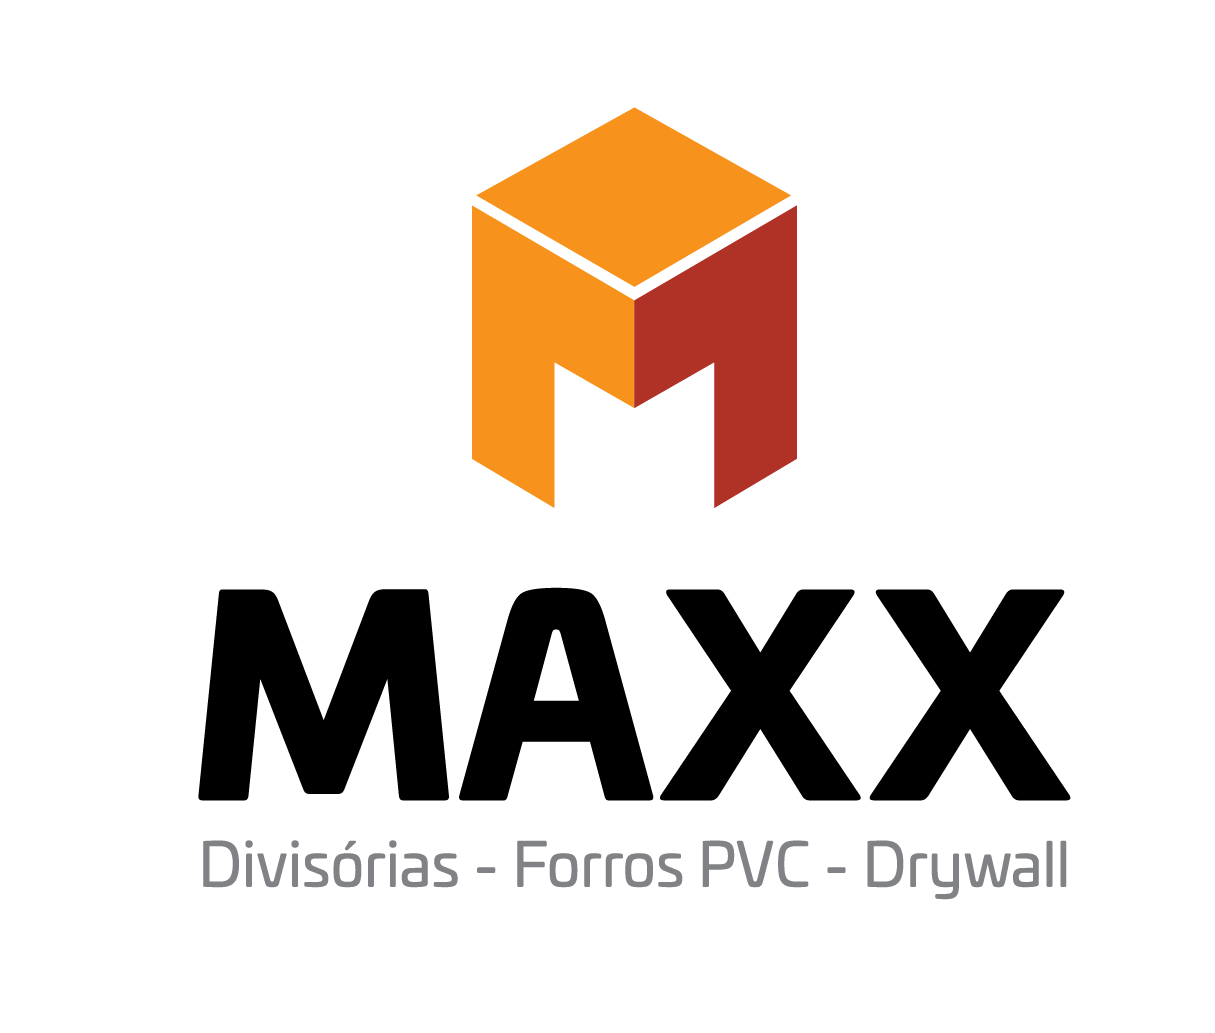 Forro de Pvc com Isolamento Térmico Ferraz de Vasconcelos - Forro de Pvc Branco - Maxx Forro